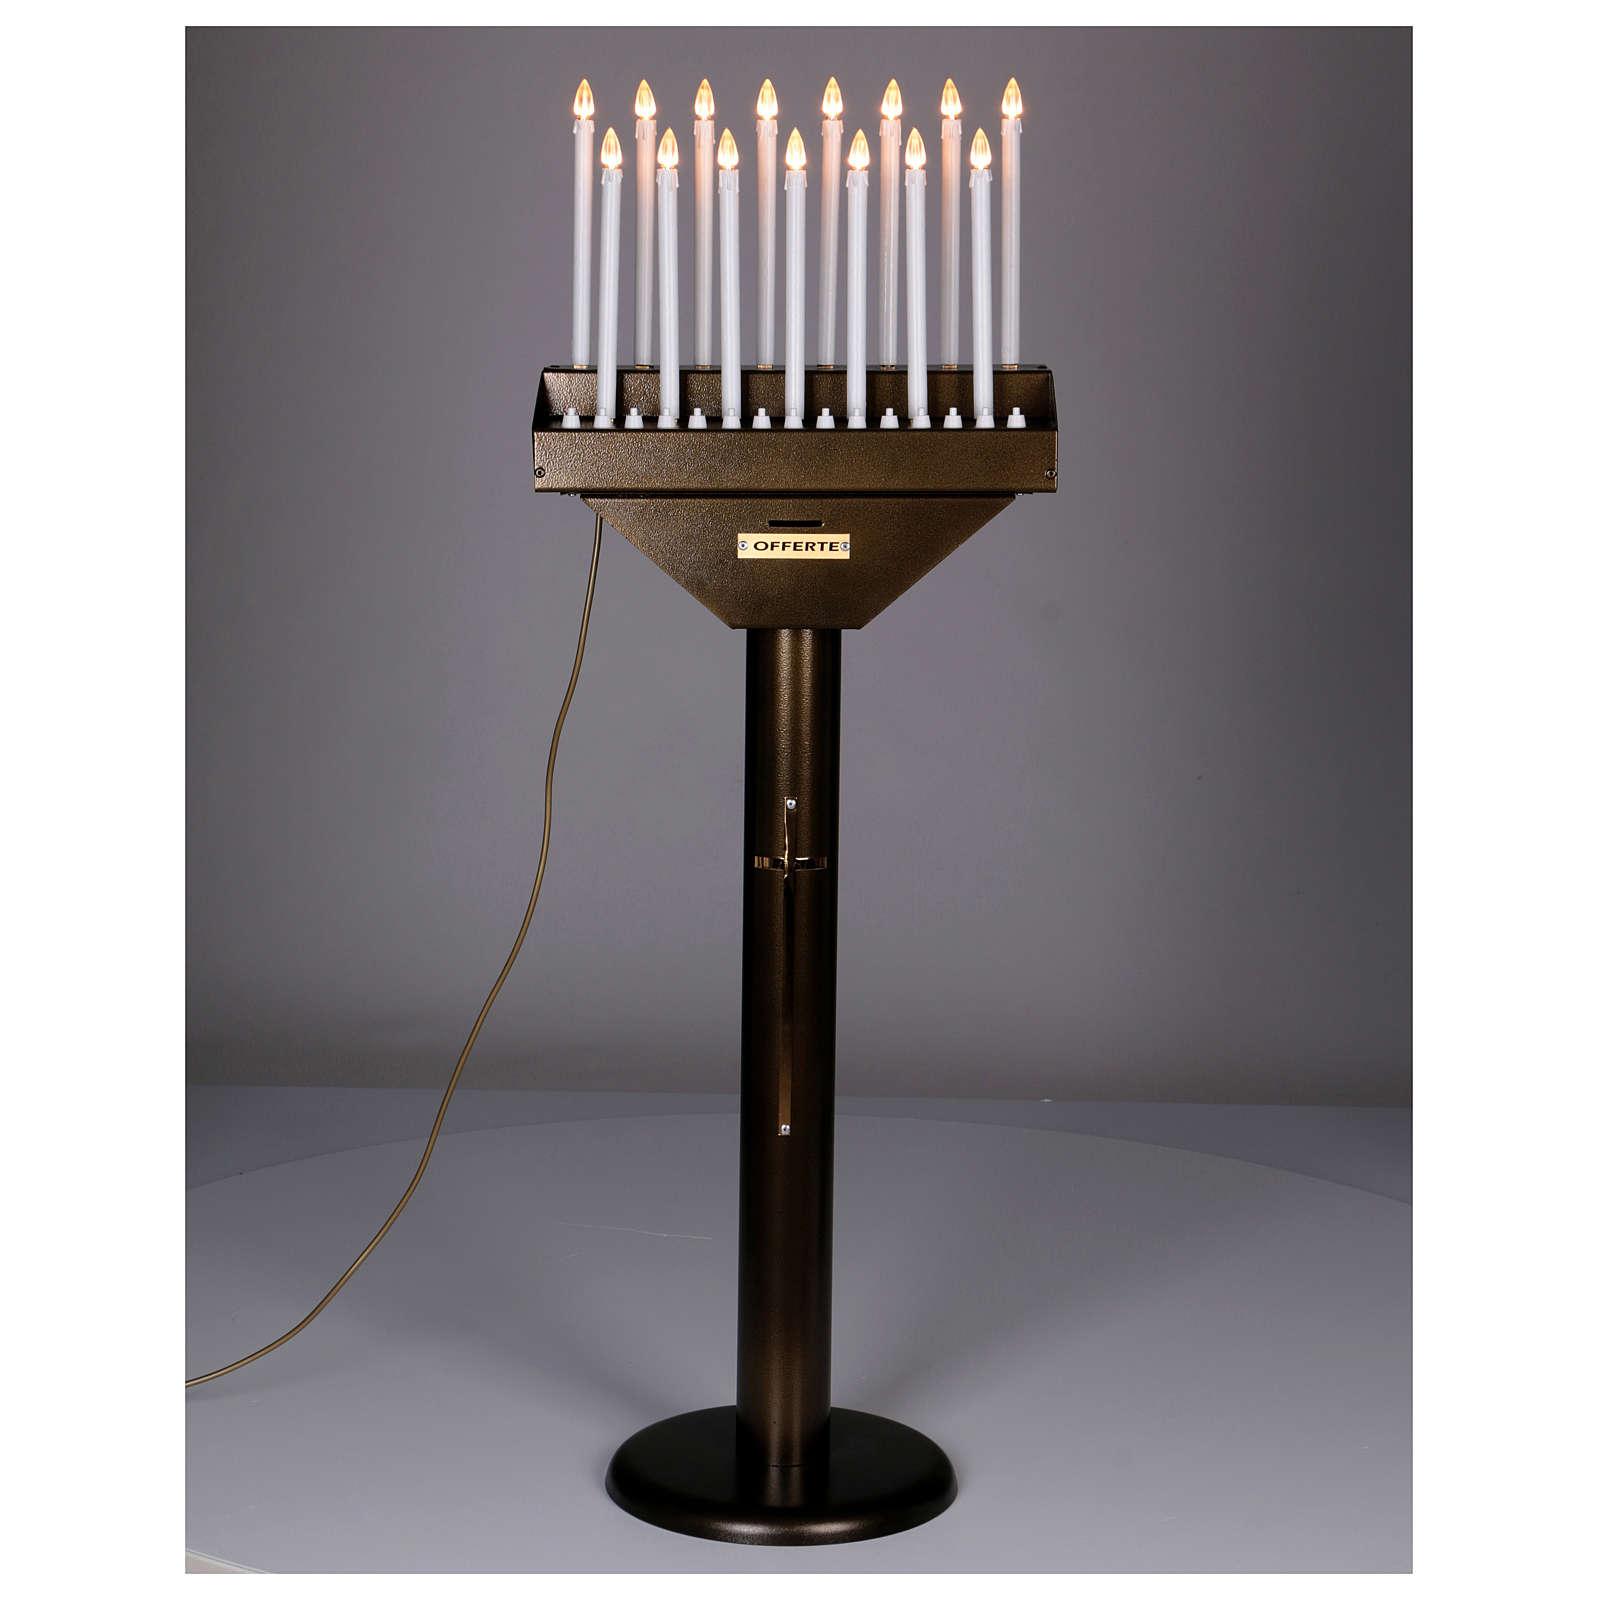 Lampadario electónico para ofrendas 15 velas, lámparas con botones 12 V 4